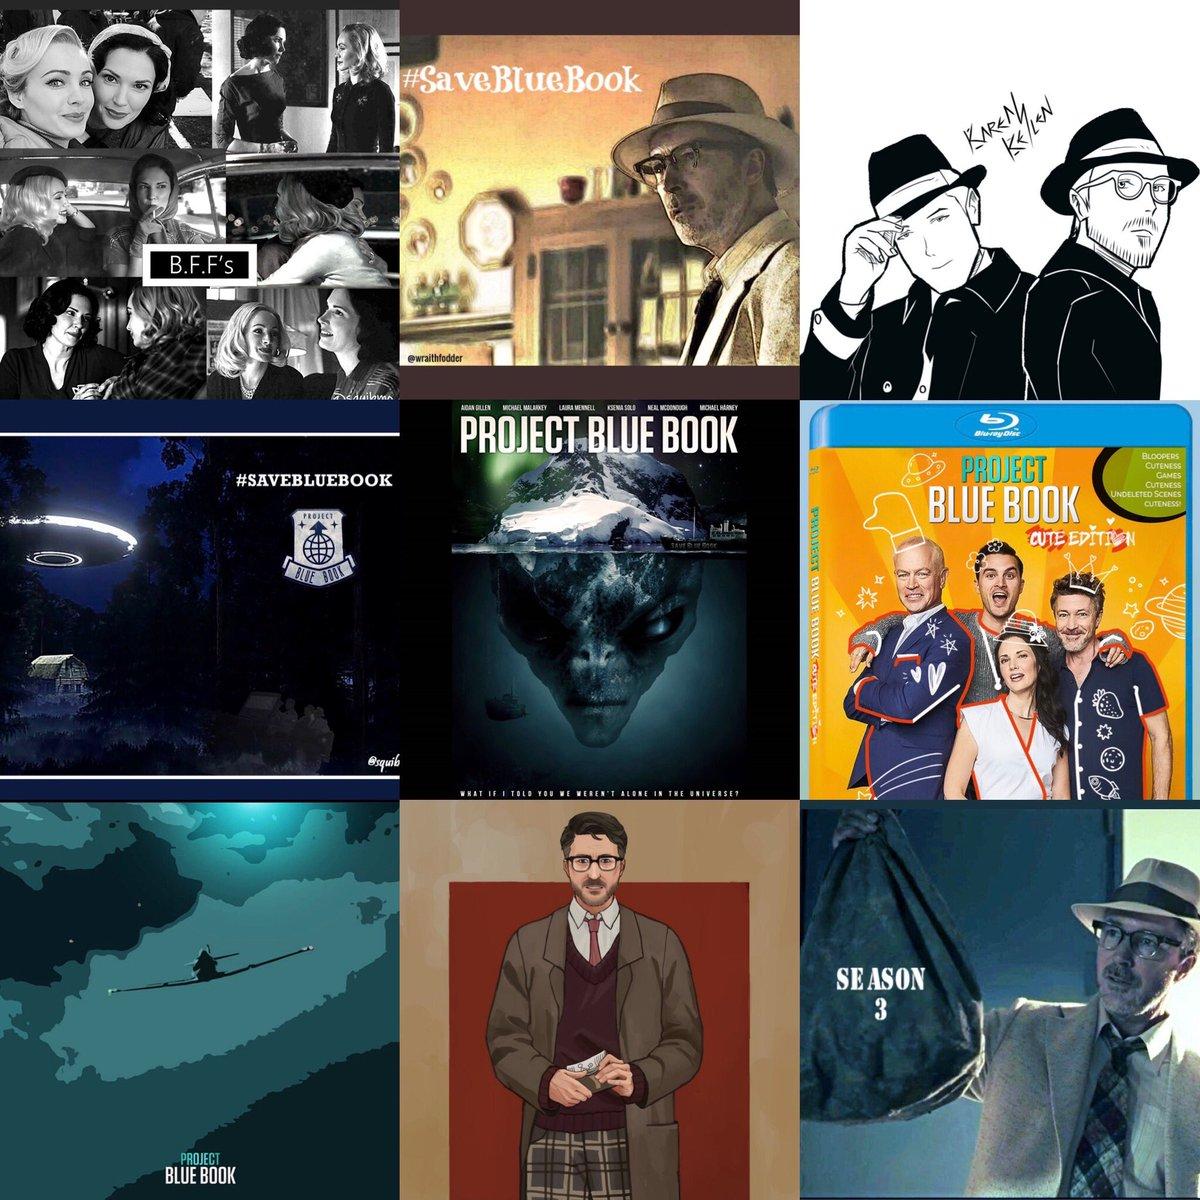 Happy #FanArtFriday! Need new #TV to #binge? #ProjectBlueBook is avail @peacockTV for free! Help #SaveBlueBook here: https://t.co/zr9UsLKMFK. Have a wonderful weekend! #HyneQuinn #UFOs #WatchTheSkies #TVshows #FridayThoughts #PBBFanArt 🕵️♂️🛸 https://t.co/GnQRYm8XbT